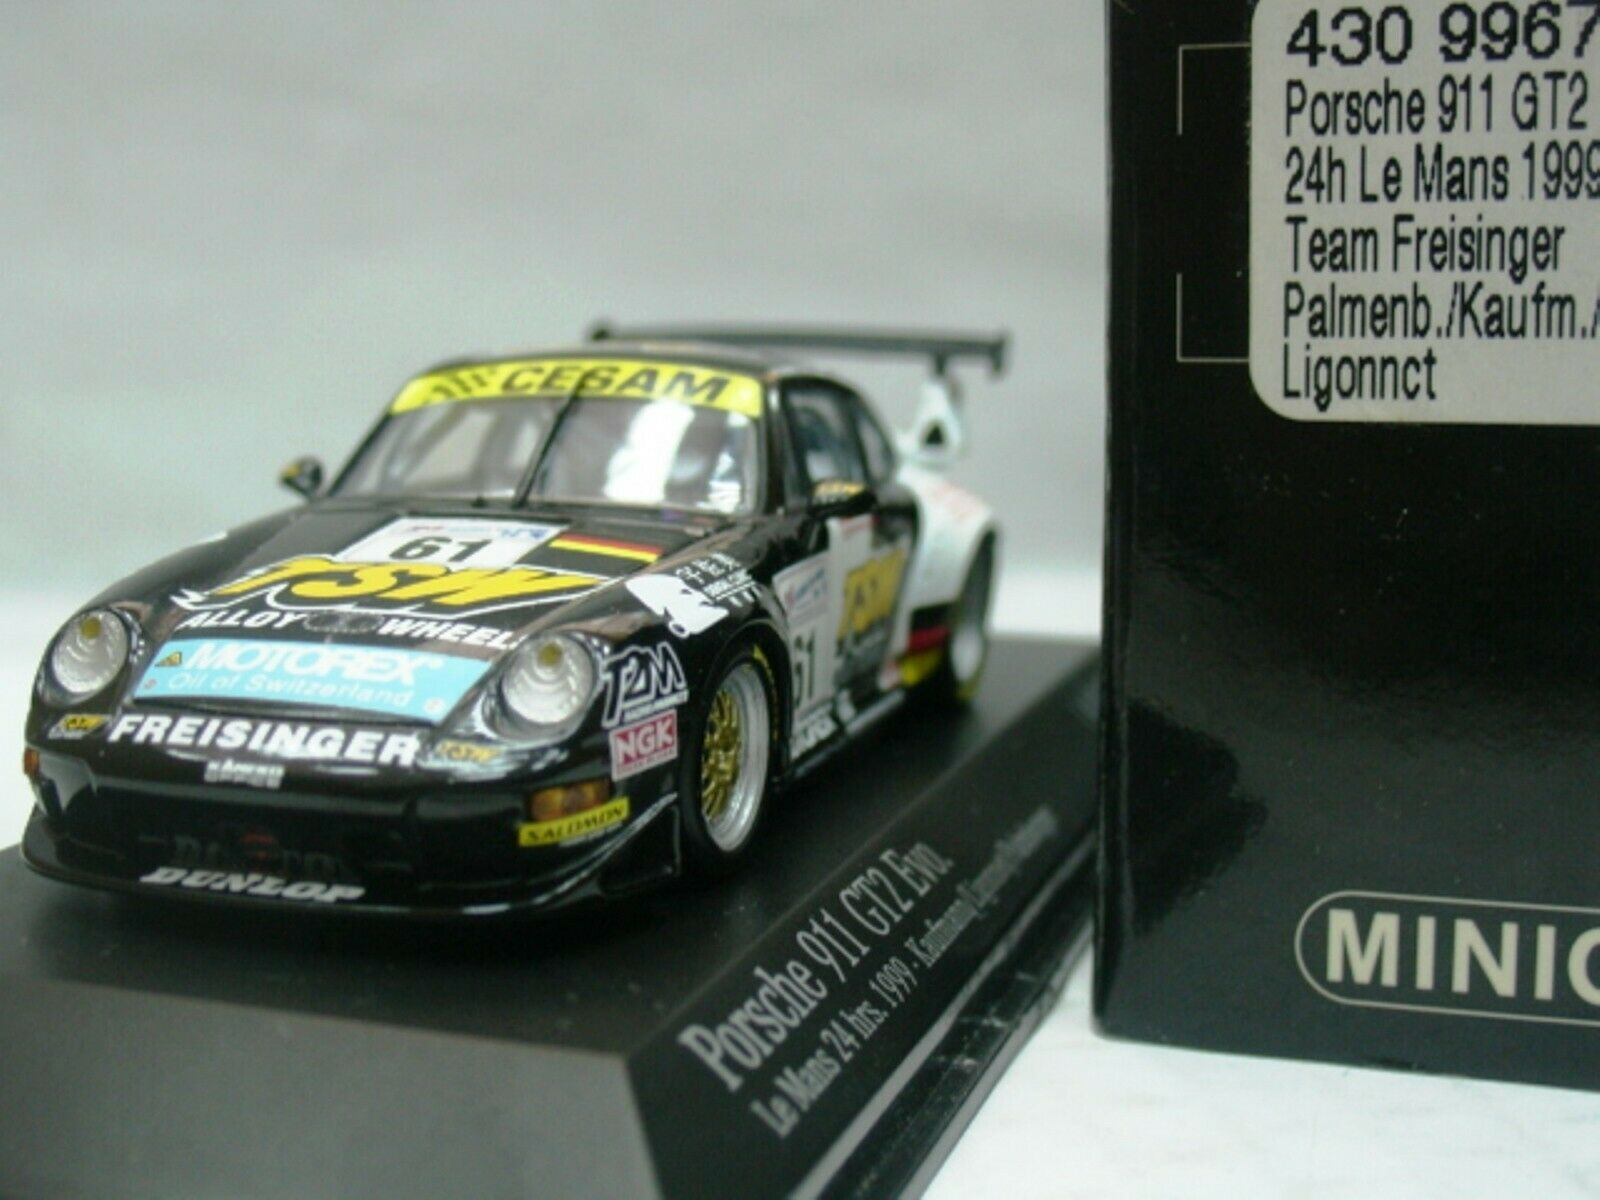 WOW EXTREMELY RARE Porsche 993 911 GT2 Evo2 LeMans 1999 1 43 Minichamps-RS